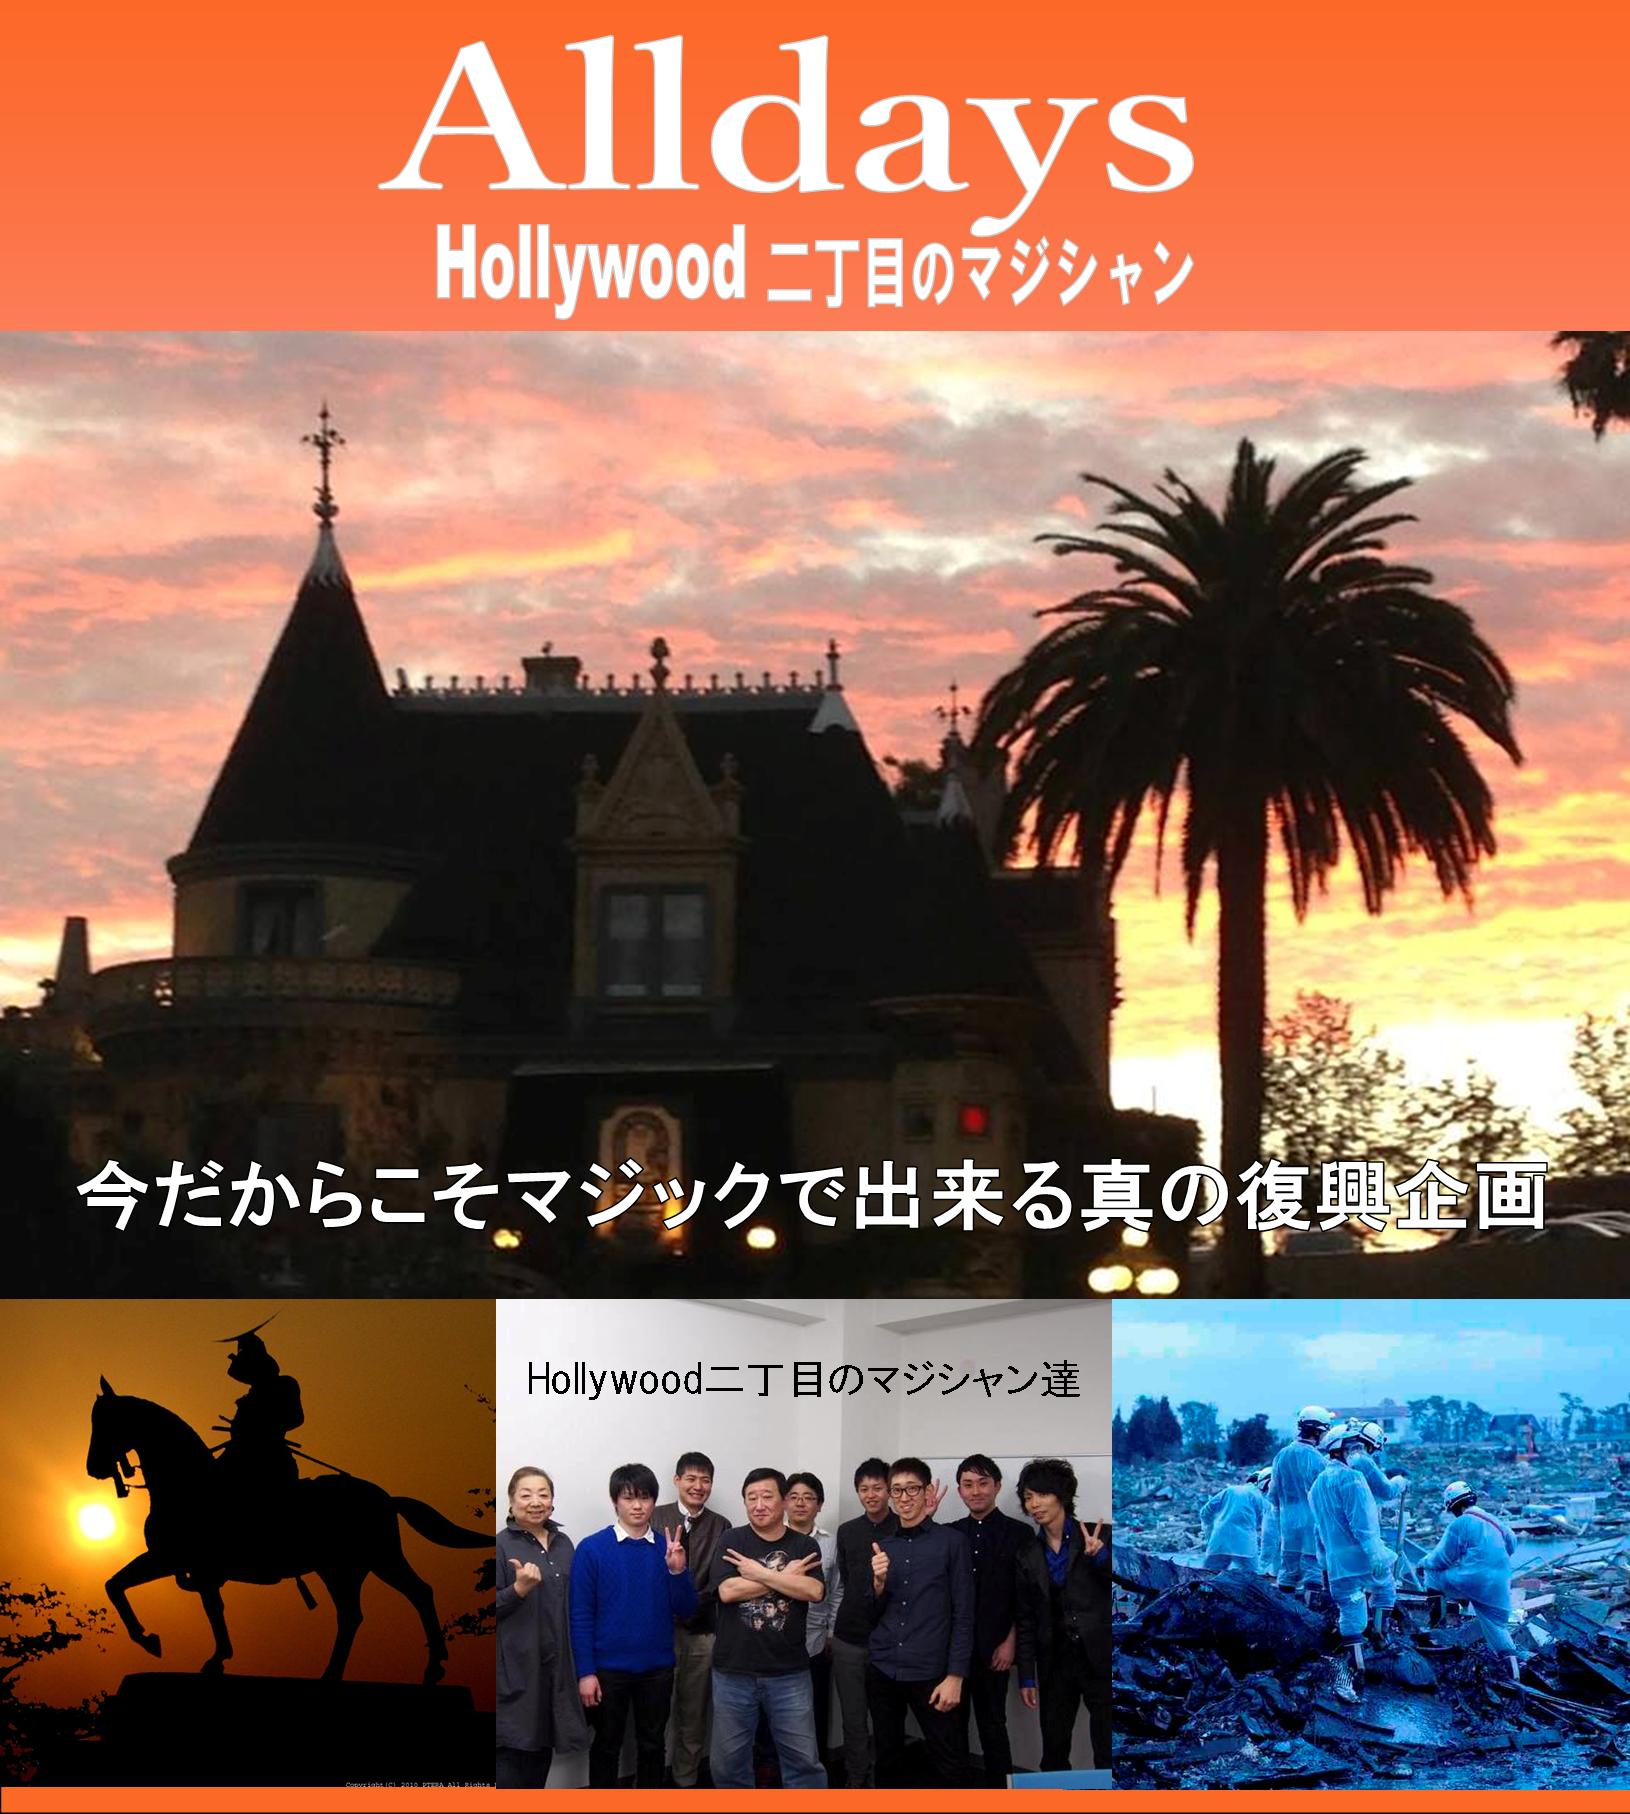 alldays02.jpg